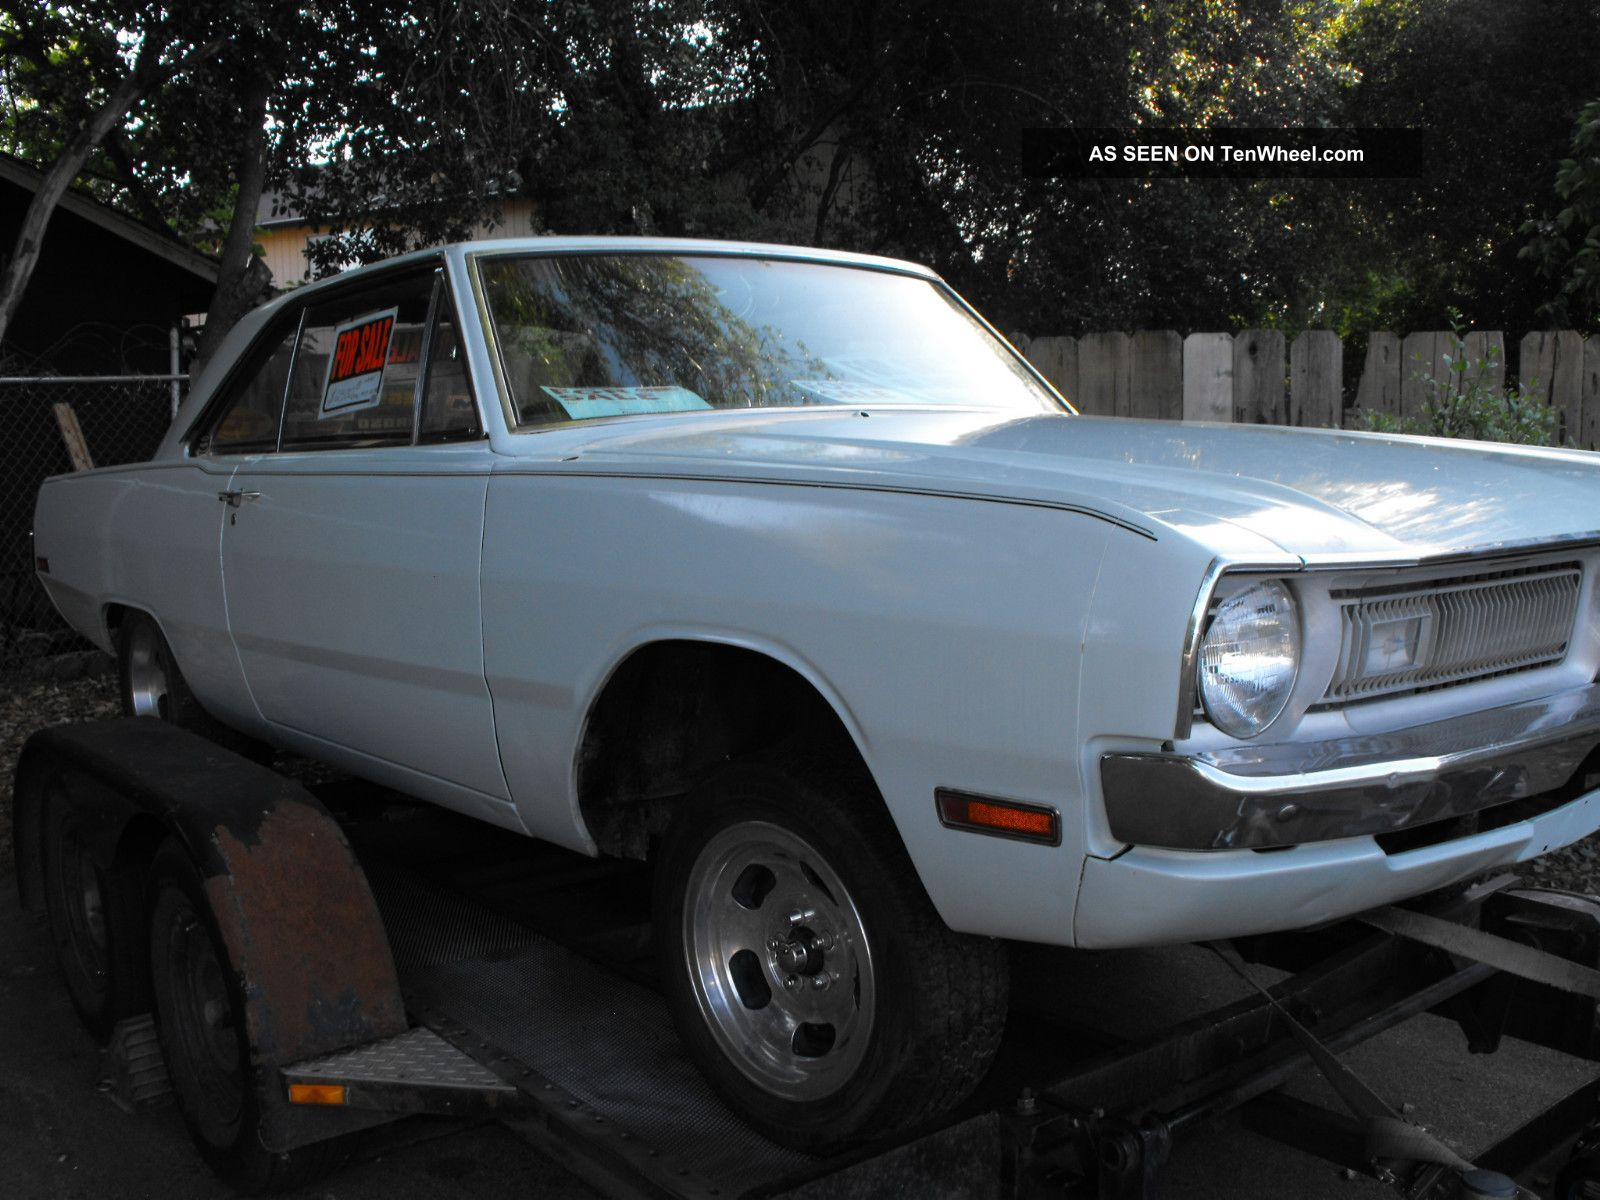 1970 Dodge Dart Drag Race / Street Machine California Rust Roller Project Dart photo